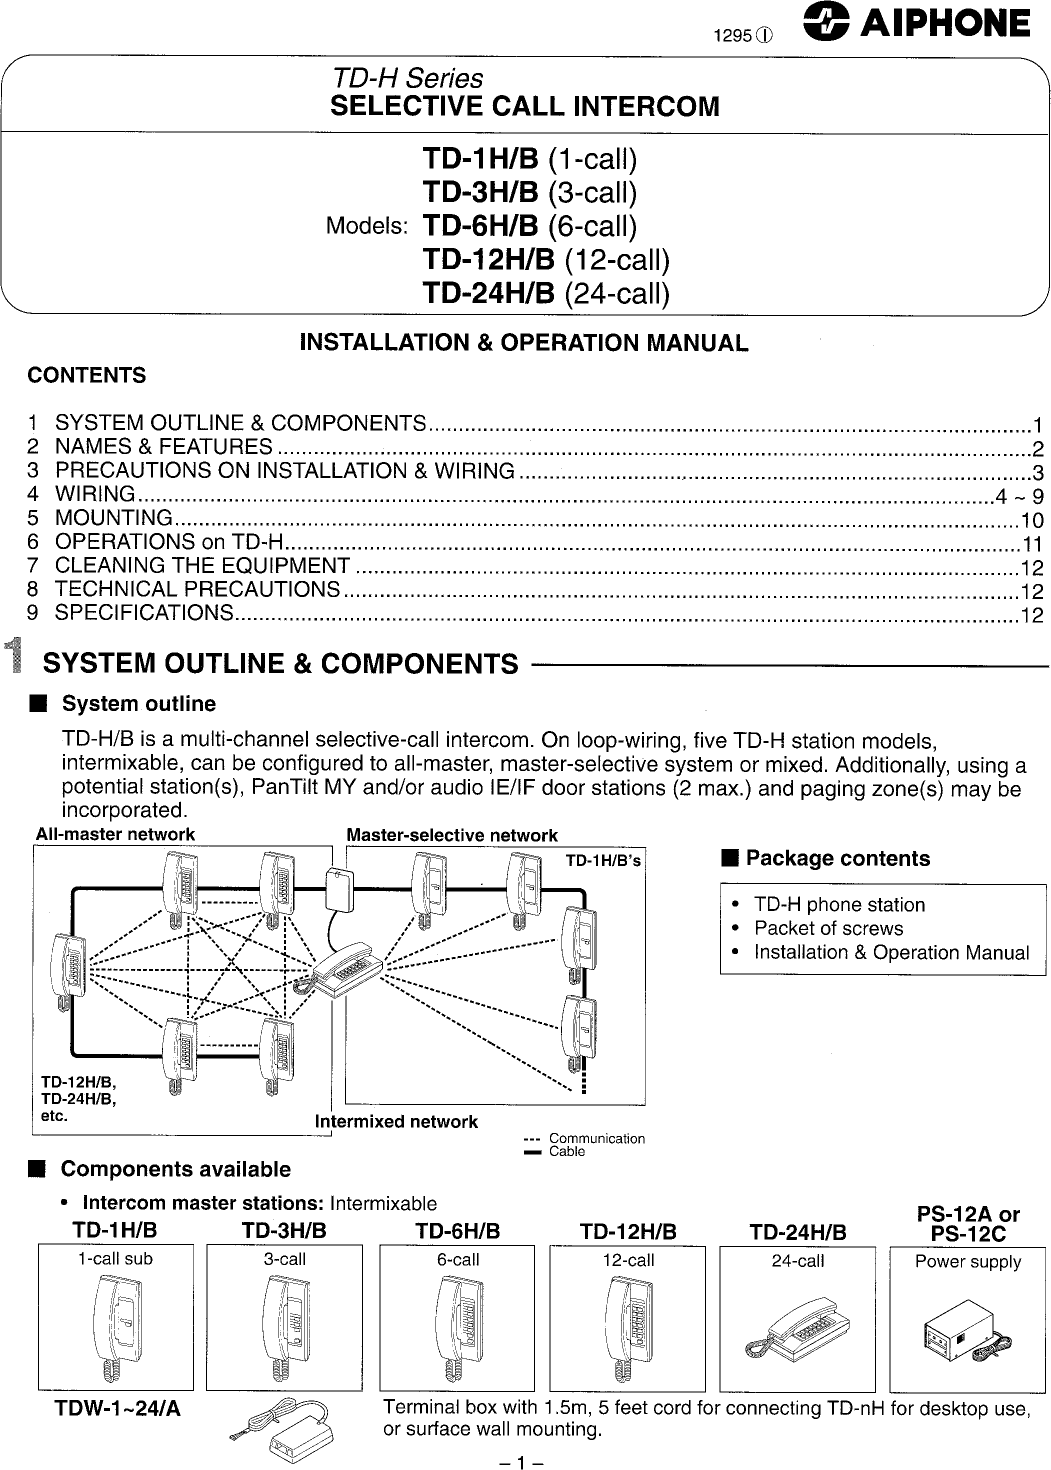 Terrific Aiphone Td 12H B Users Manual Wiring 101 Olytiaxxcnl